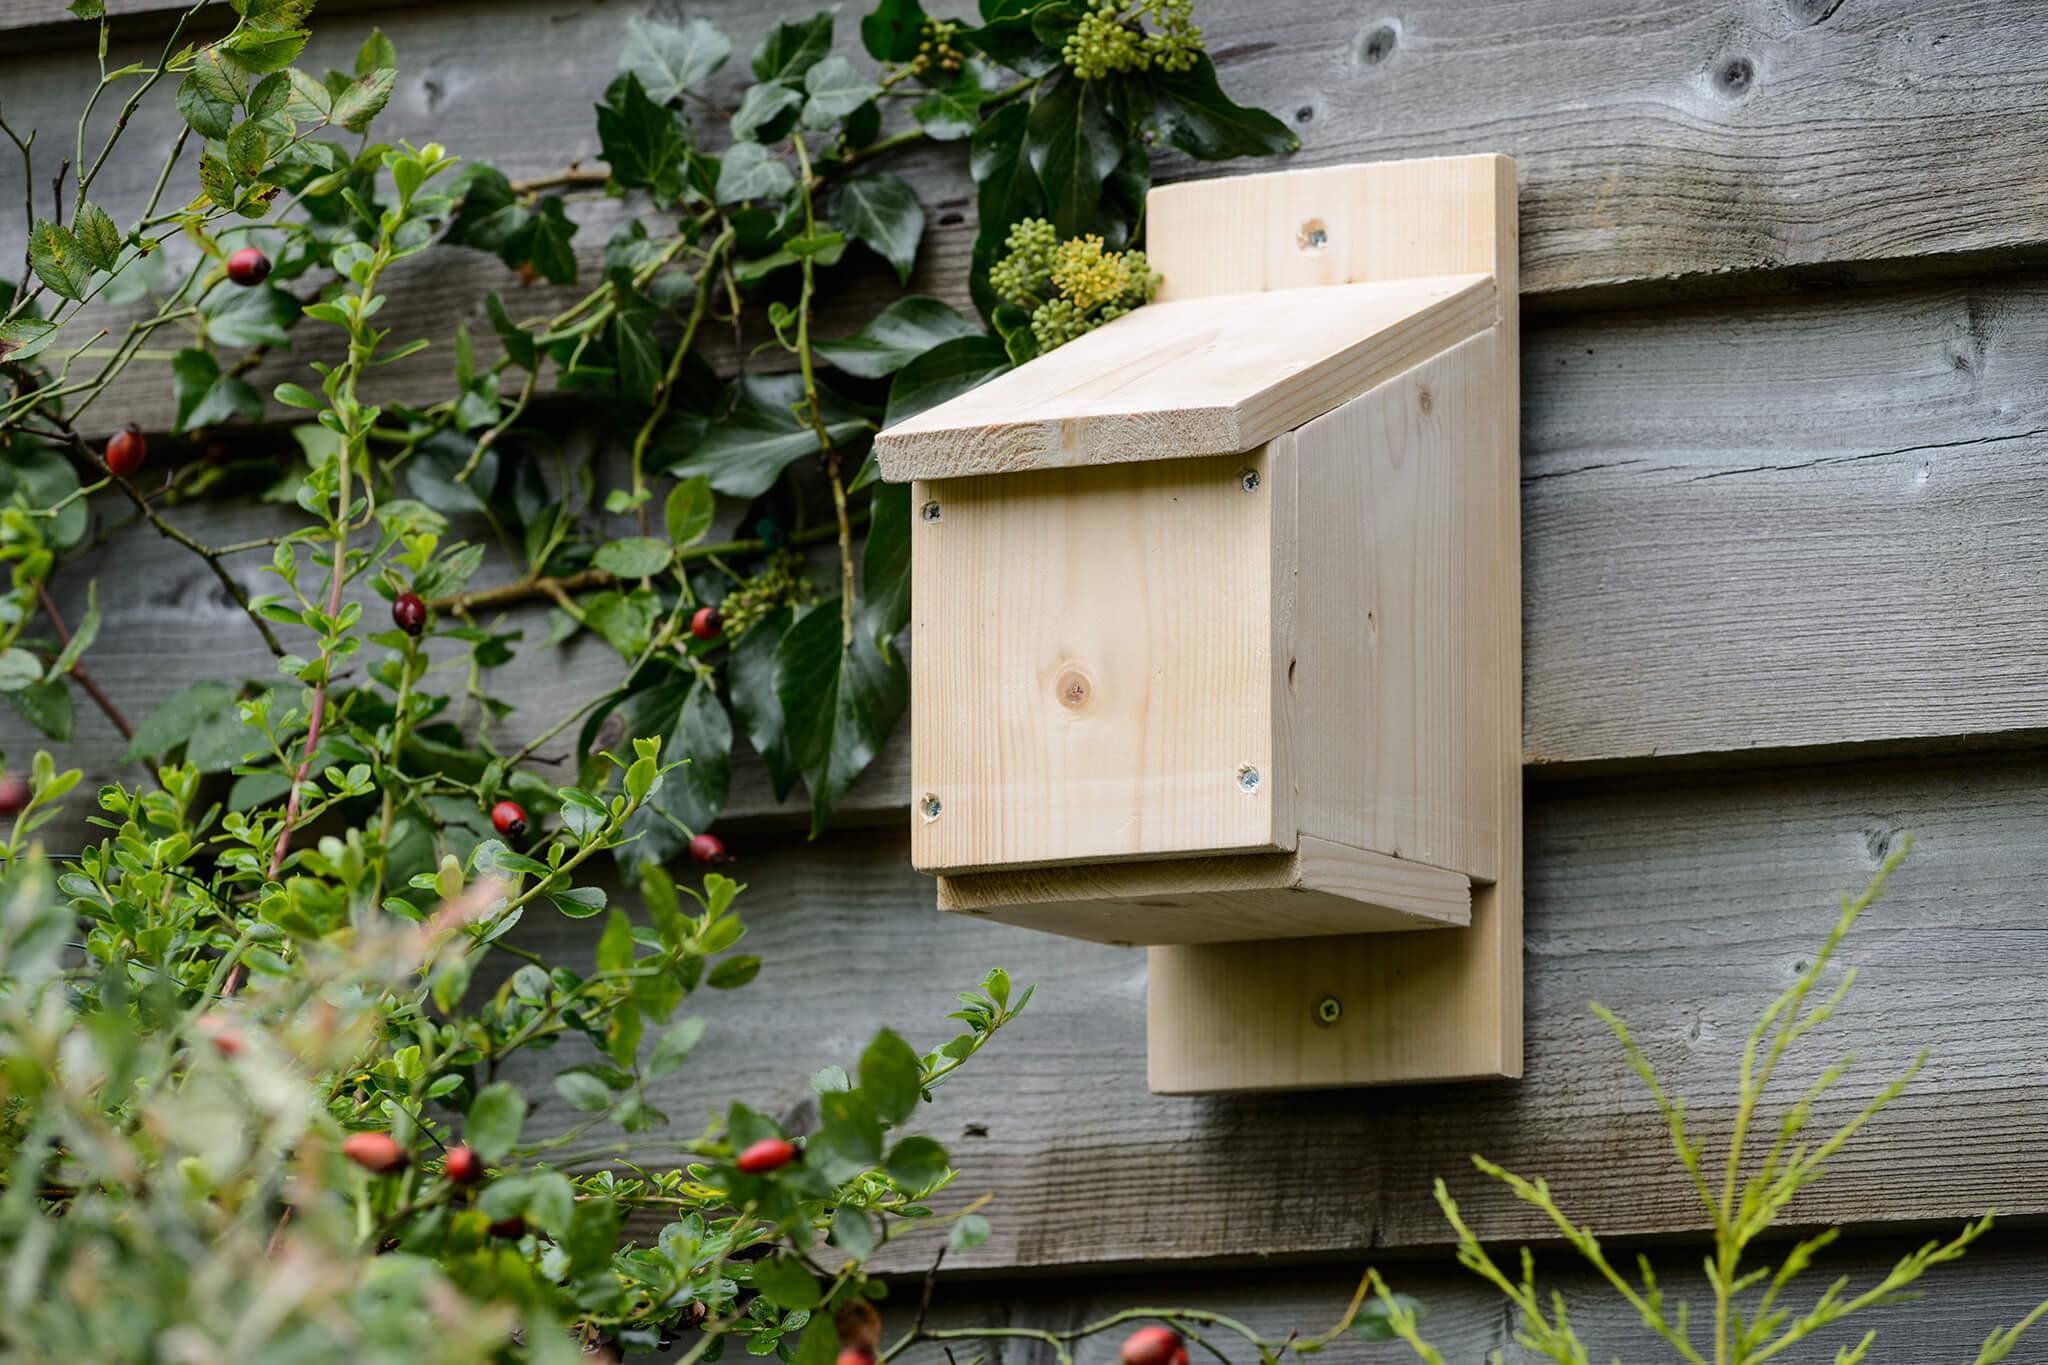 Make a Bat Box (step-by-step)